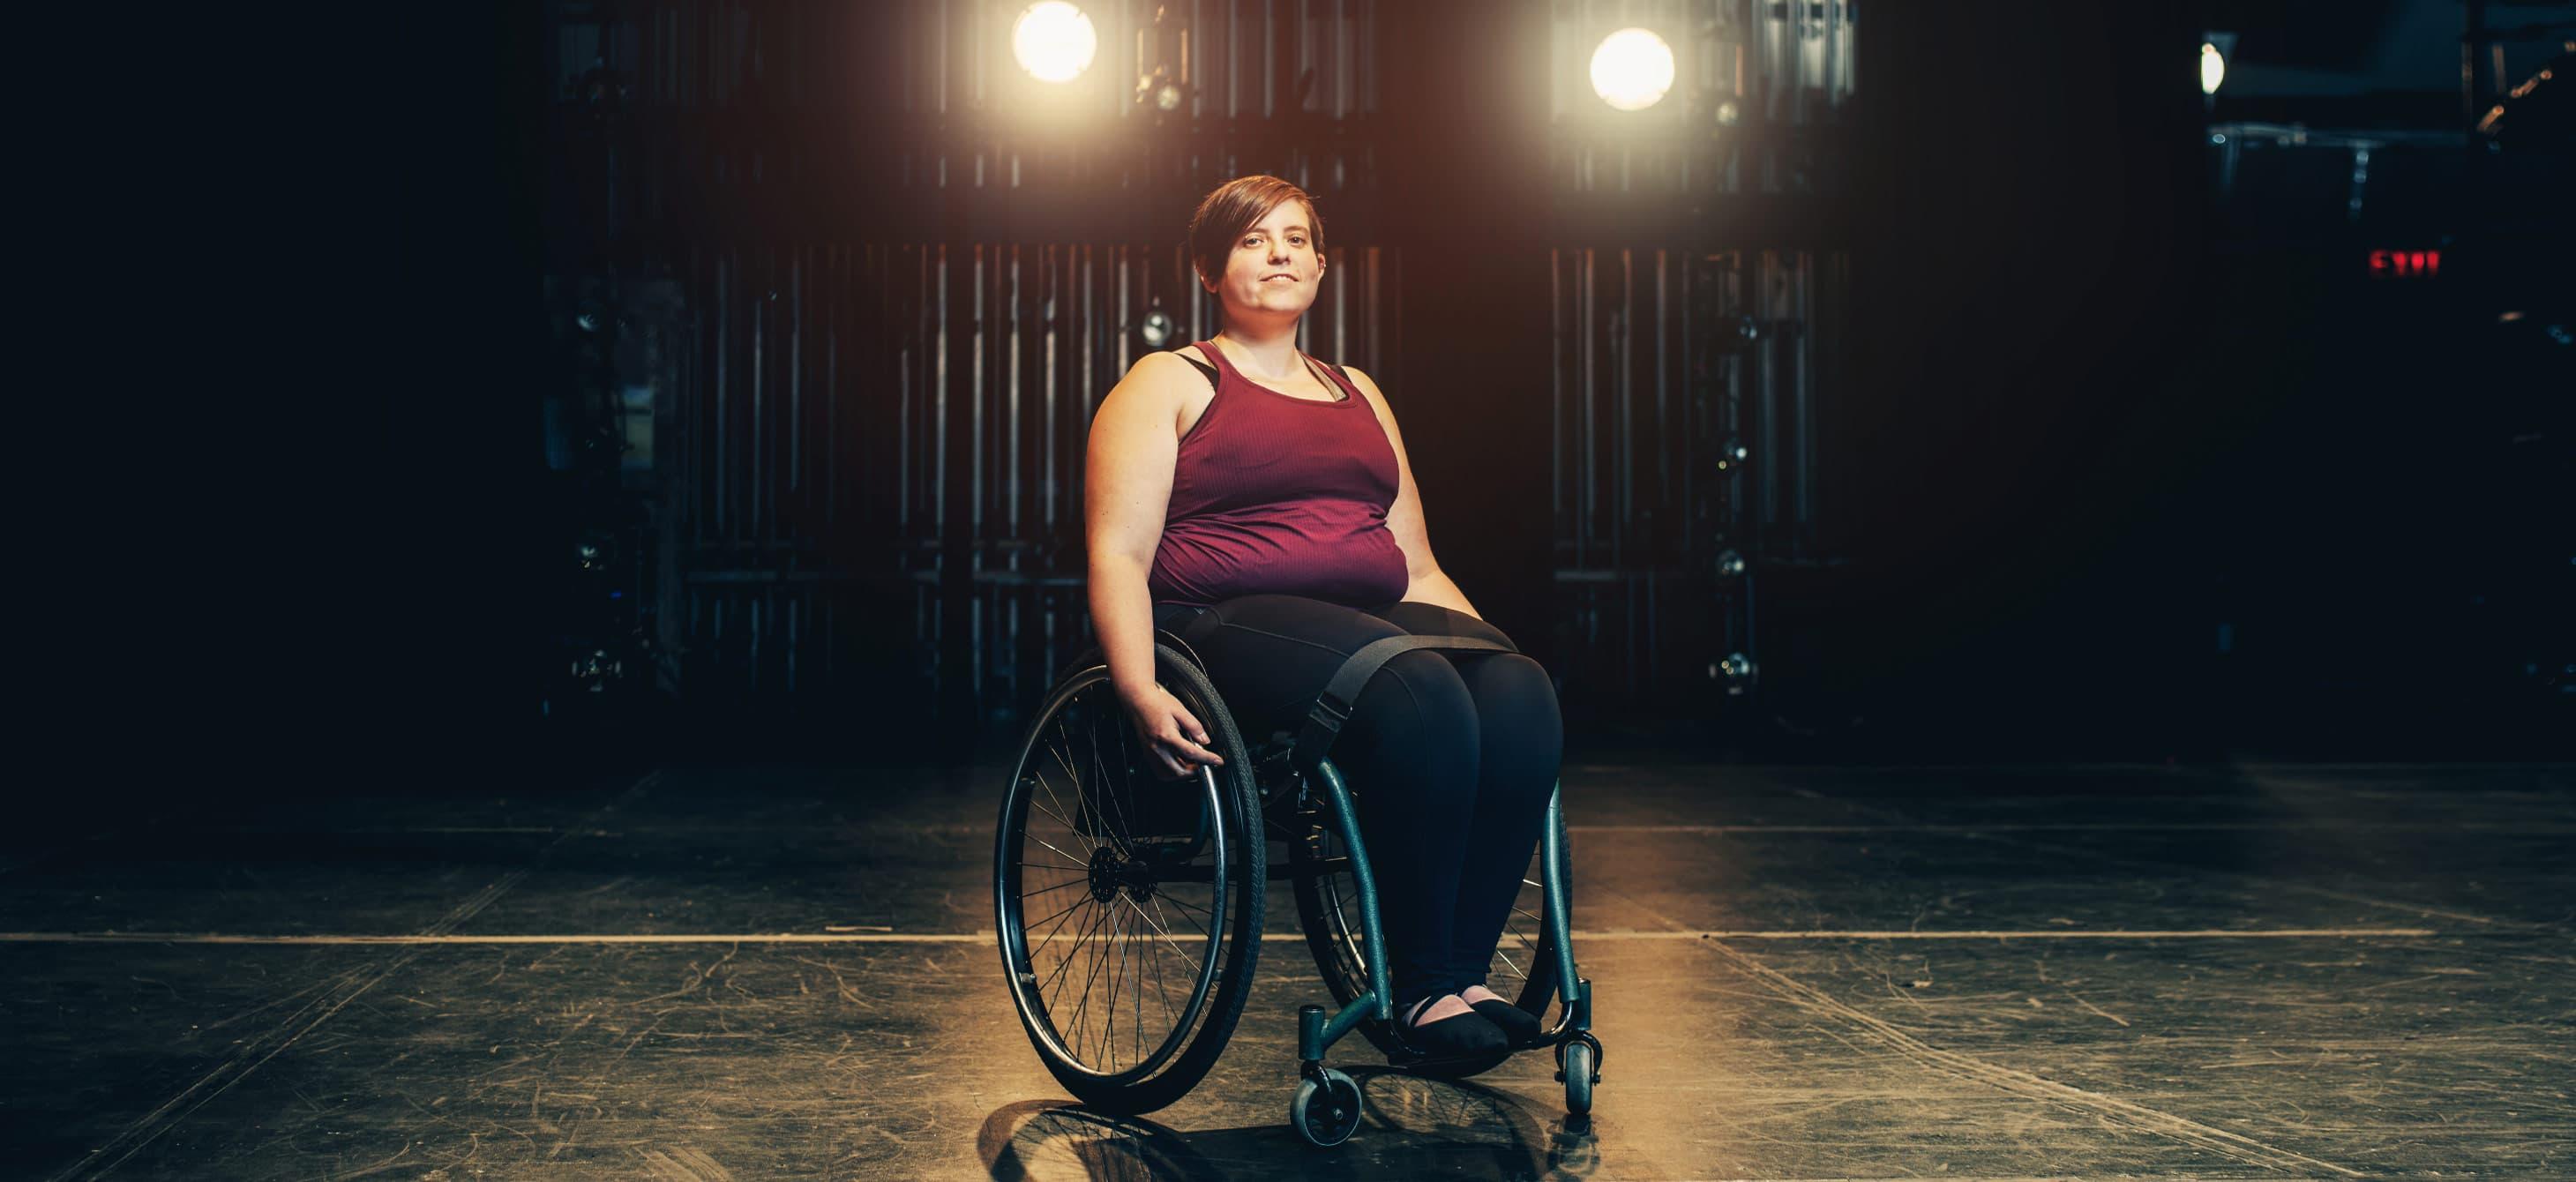 Wheelchair dancer and performance art critic Shay Erlich